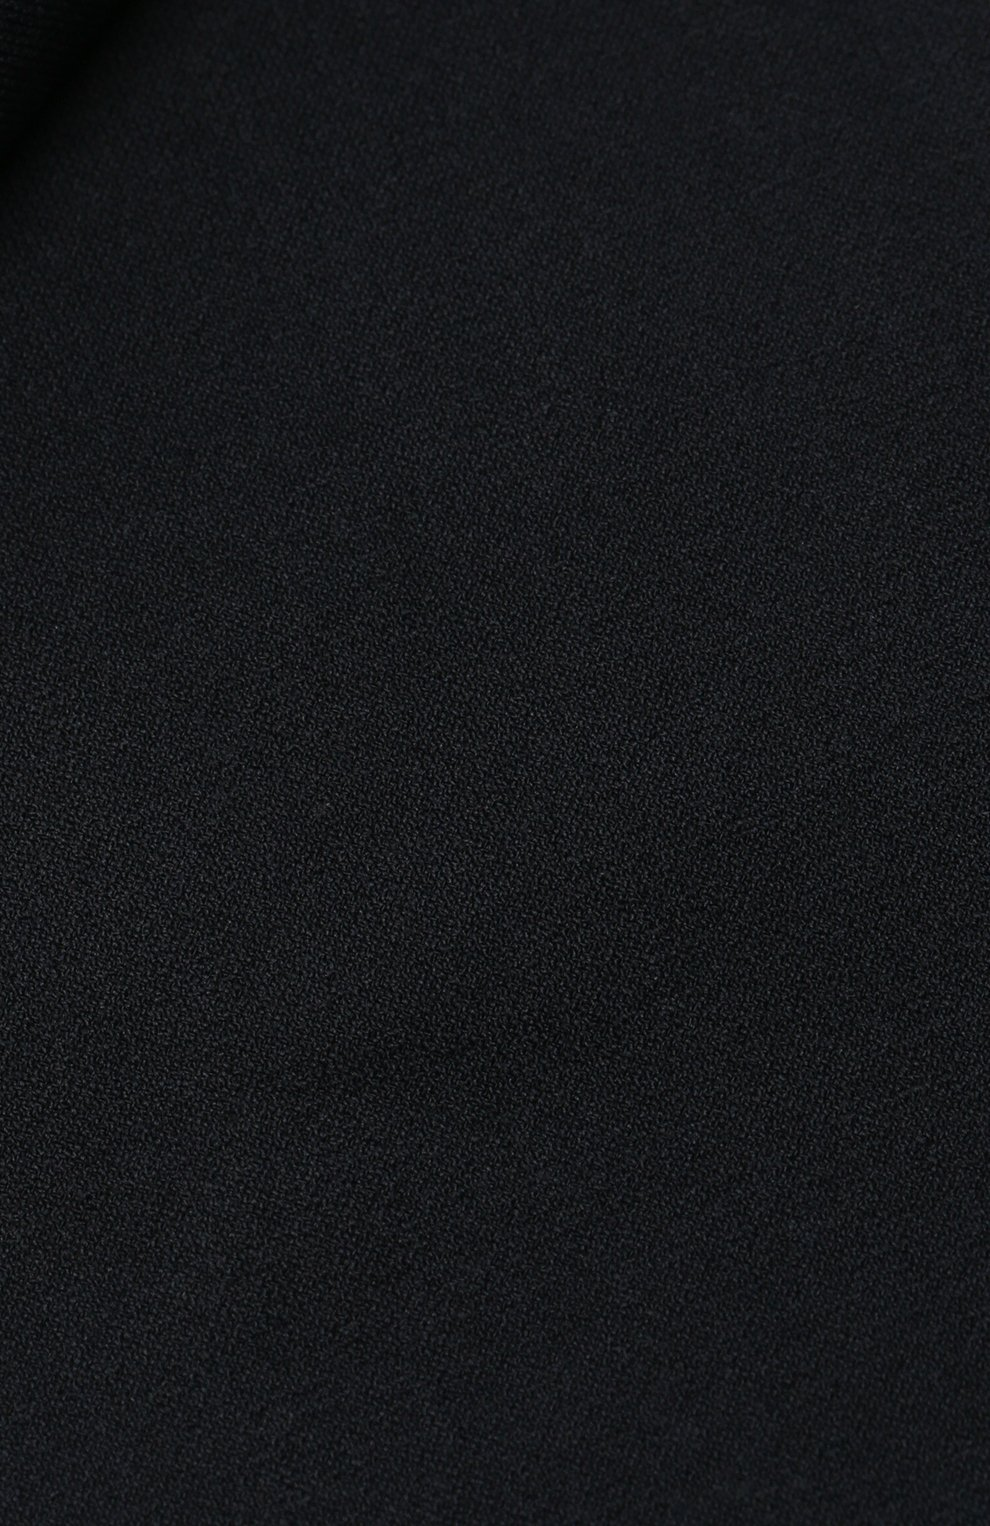 Детские колготки LA PERLA синего цвета, арт. 46105/1-3 | Фото 2 (Материал: Текстиль)